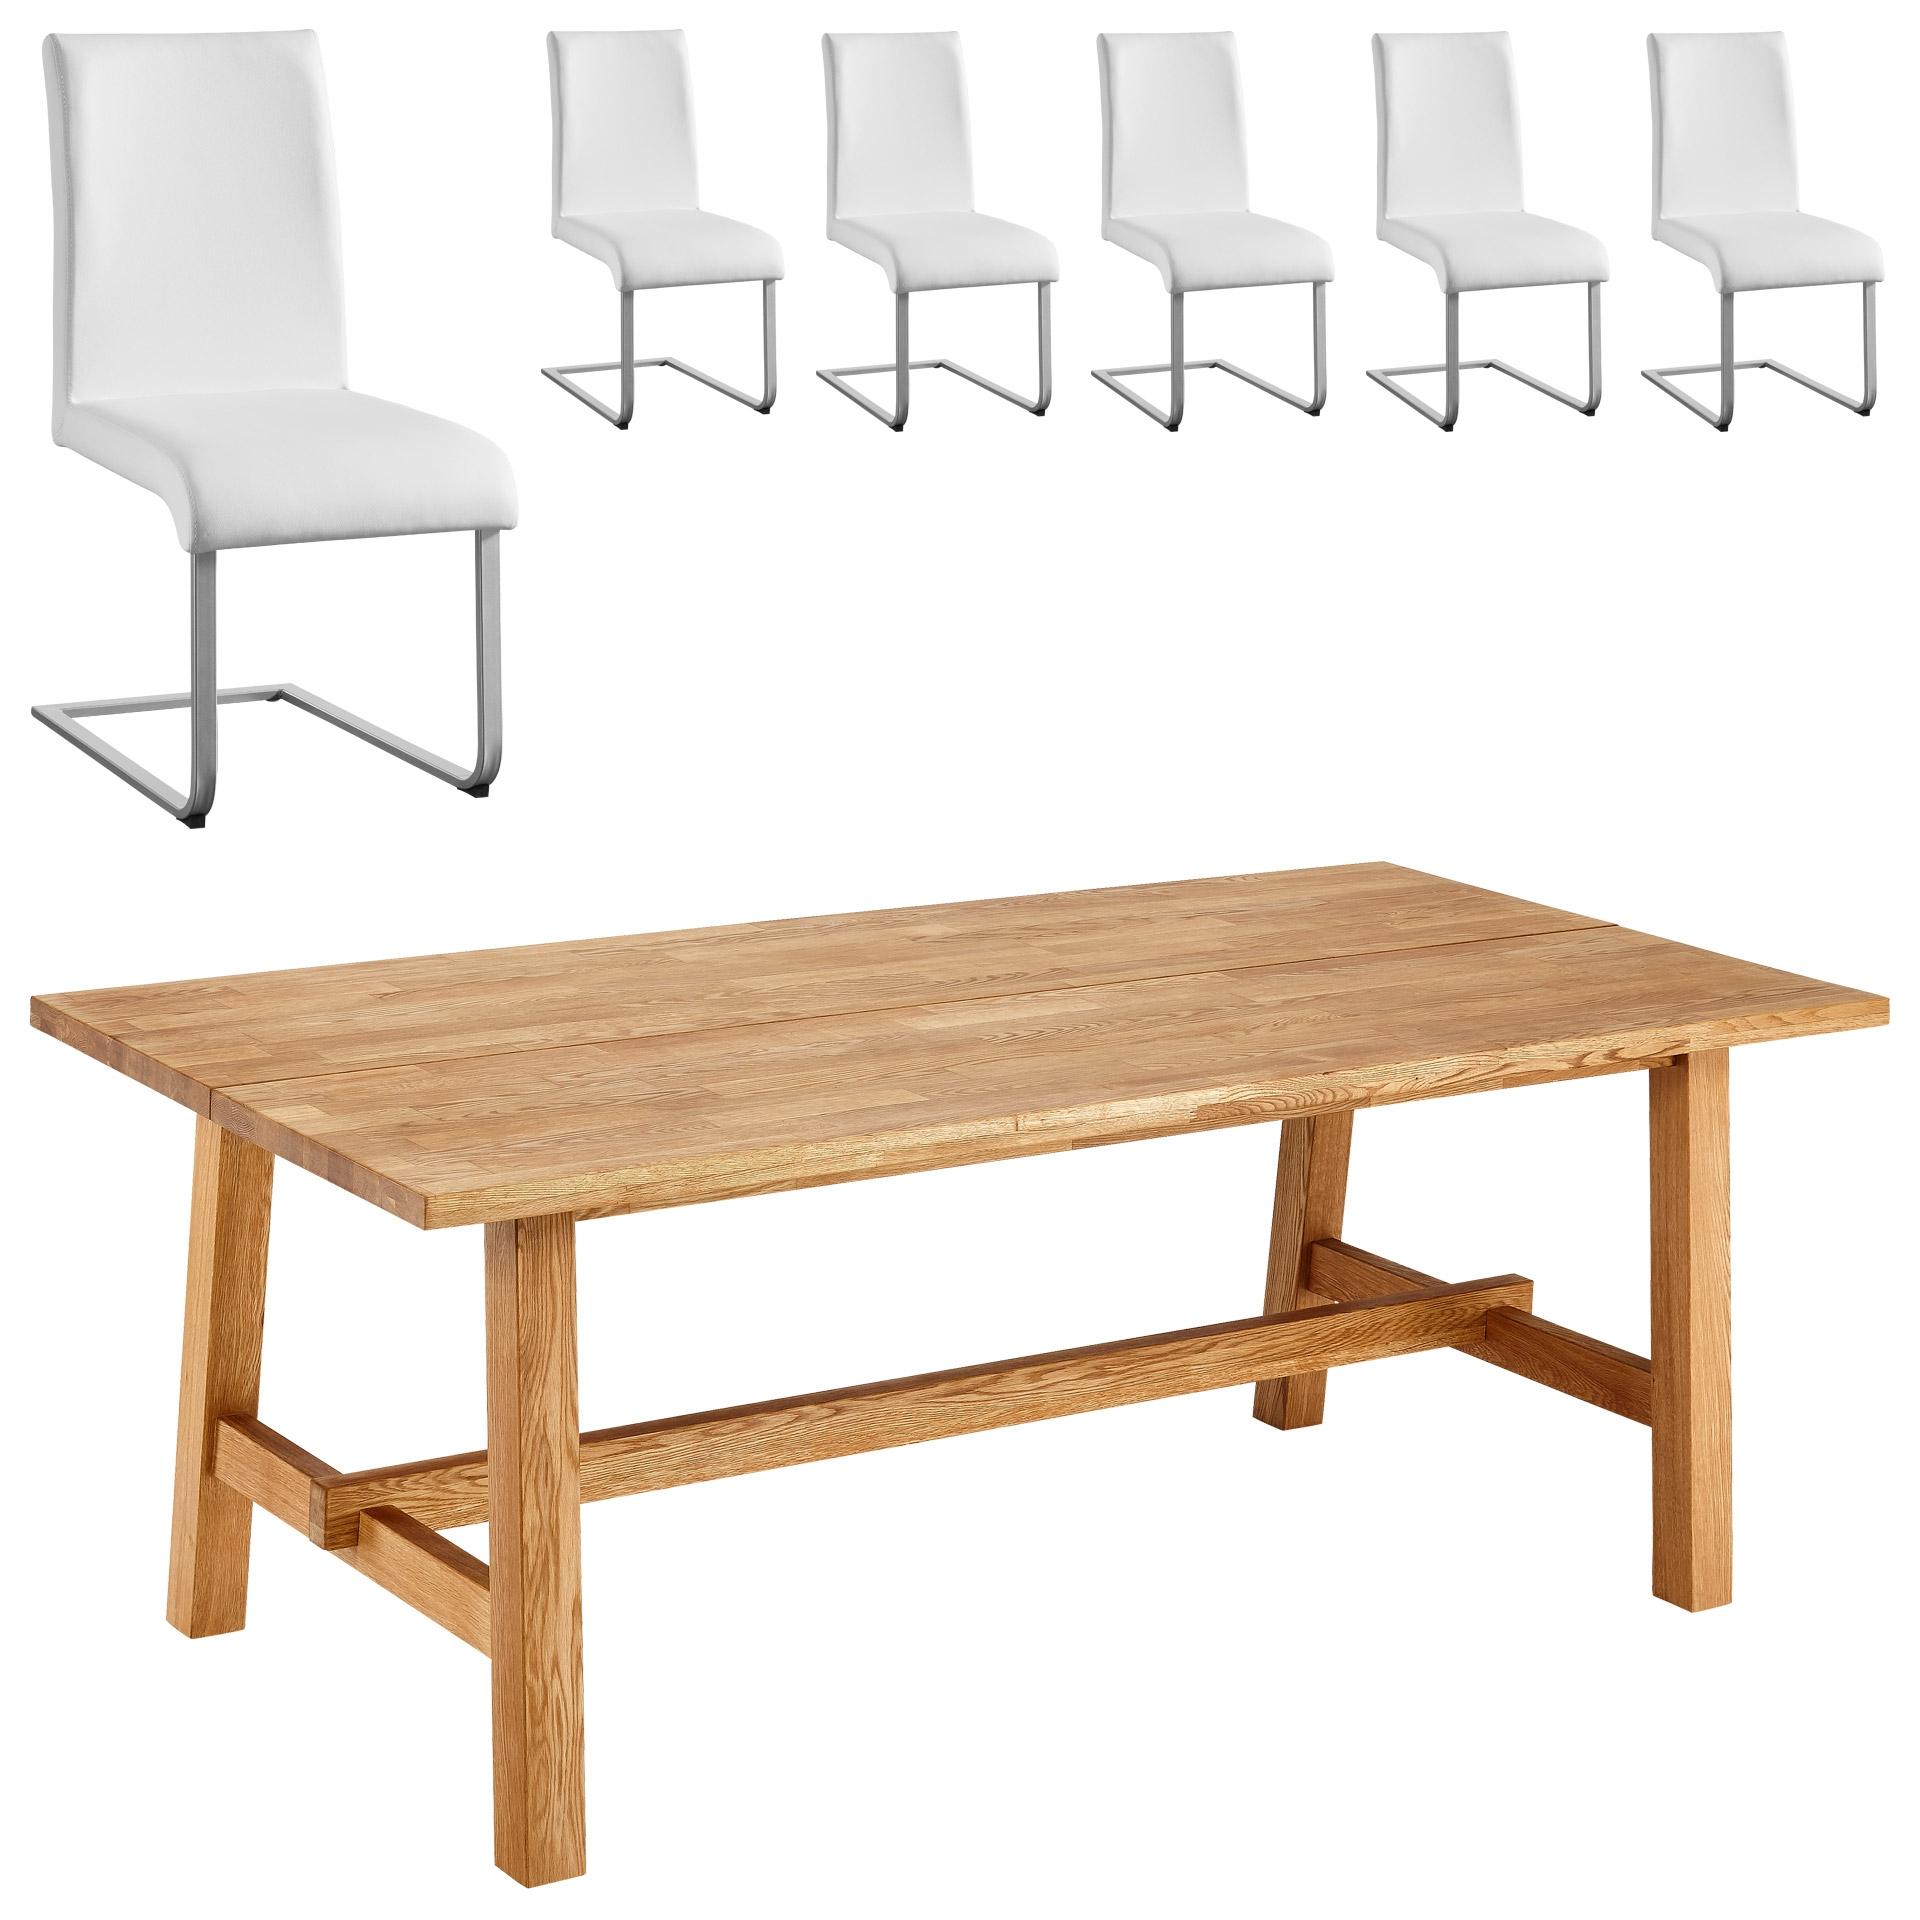 Essgruppe Lendrup/Move (200x95, 6 Stühle, weiß)